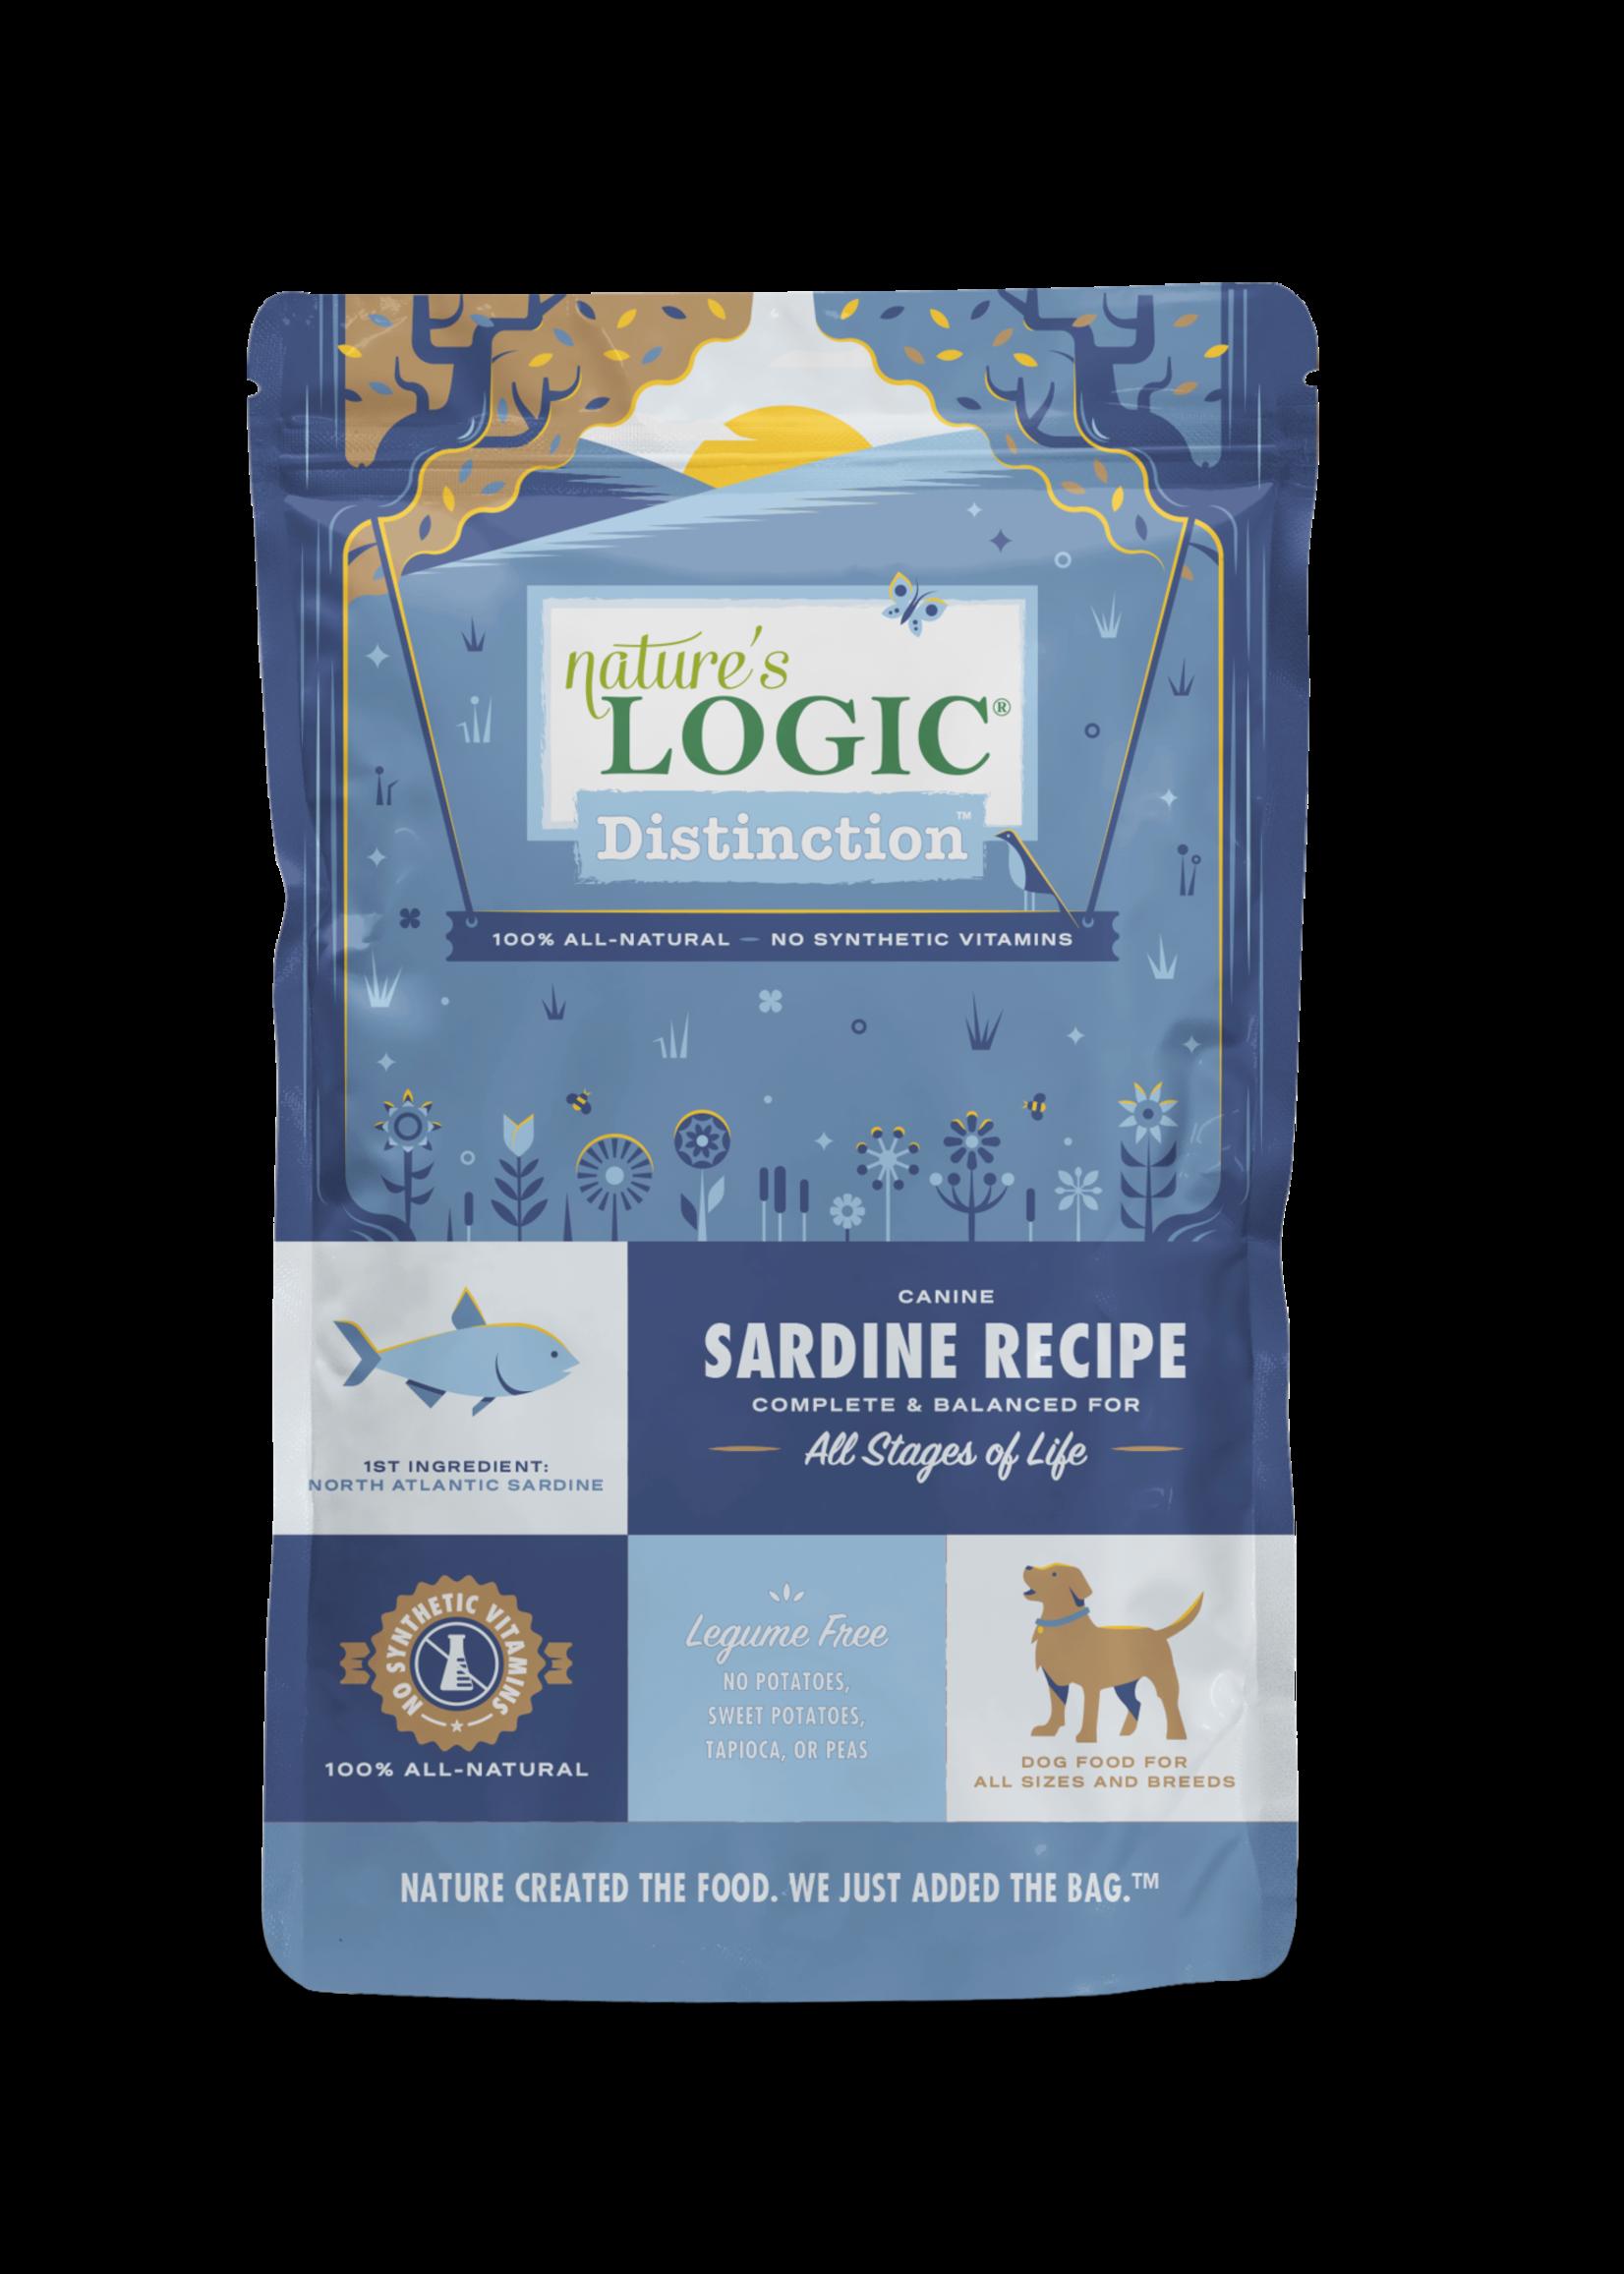 Nature's Logic Nature's Logic Distinction Sardine Dry Dog Food 4.4lbs